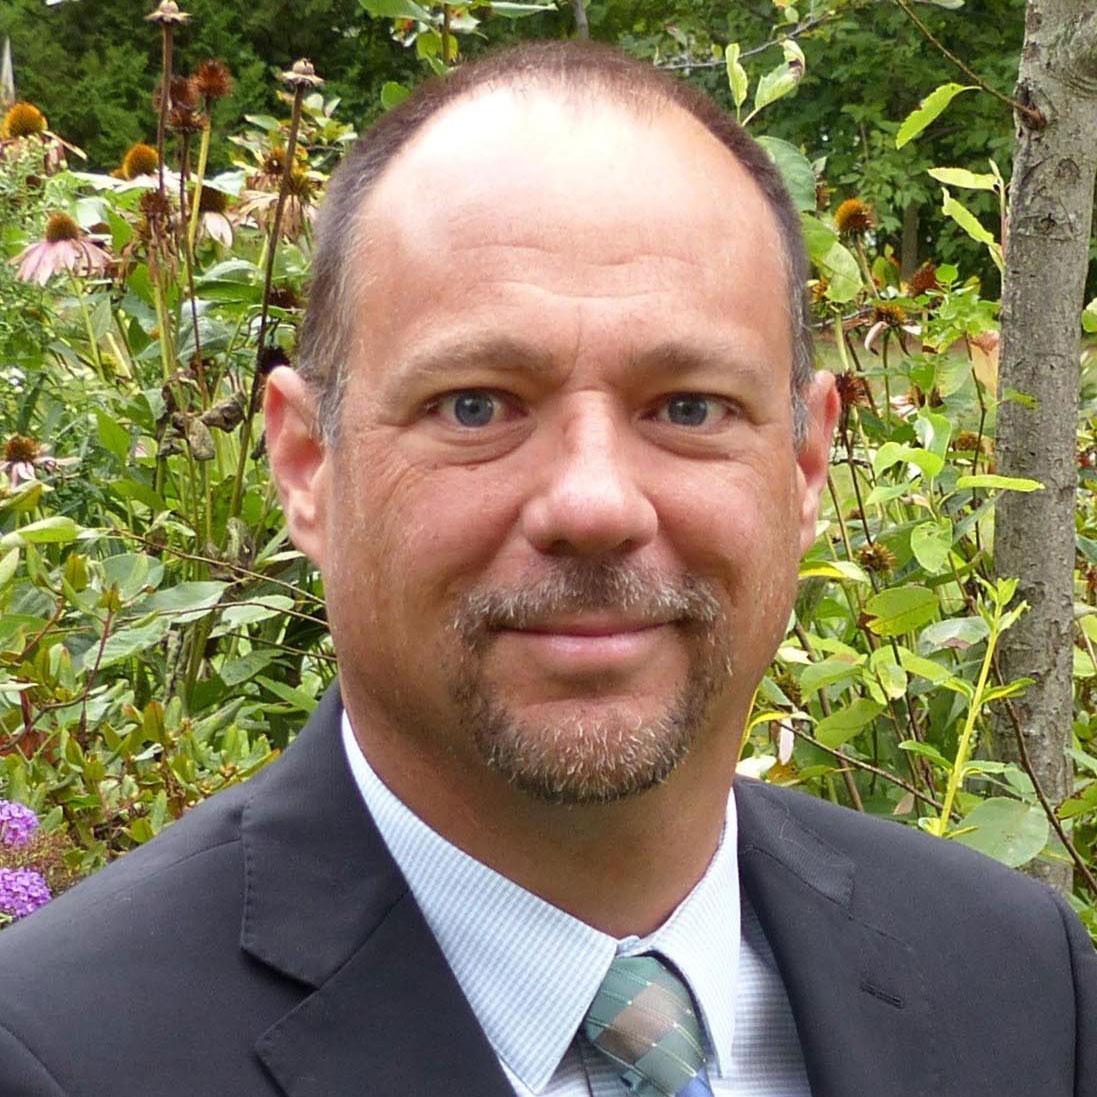 Jim Stenberg